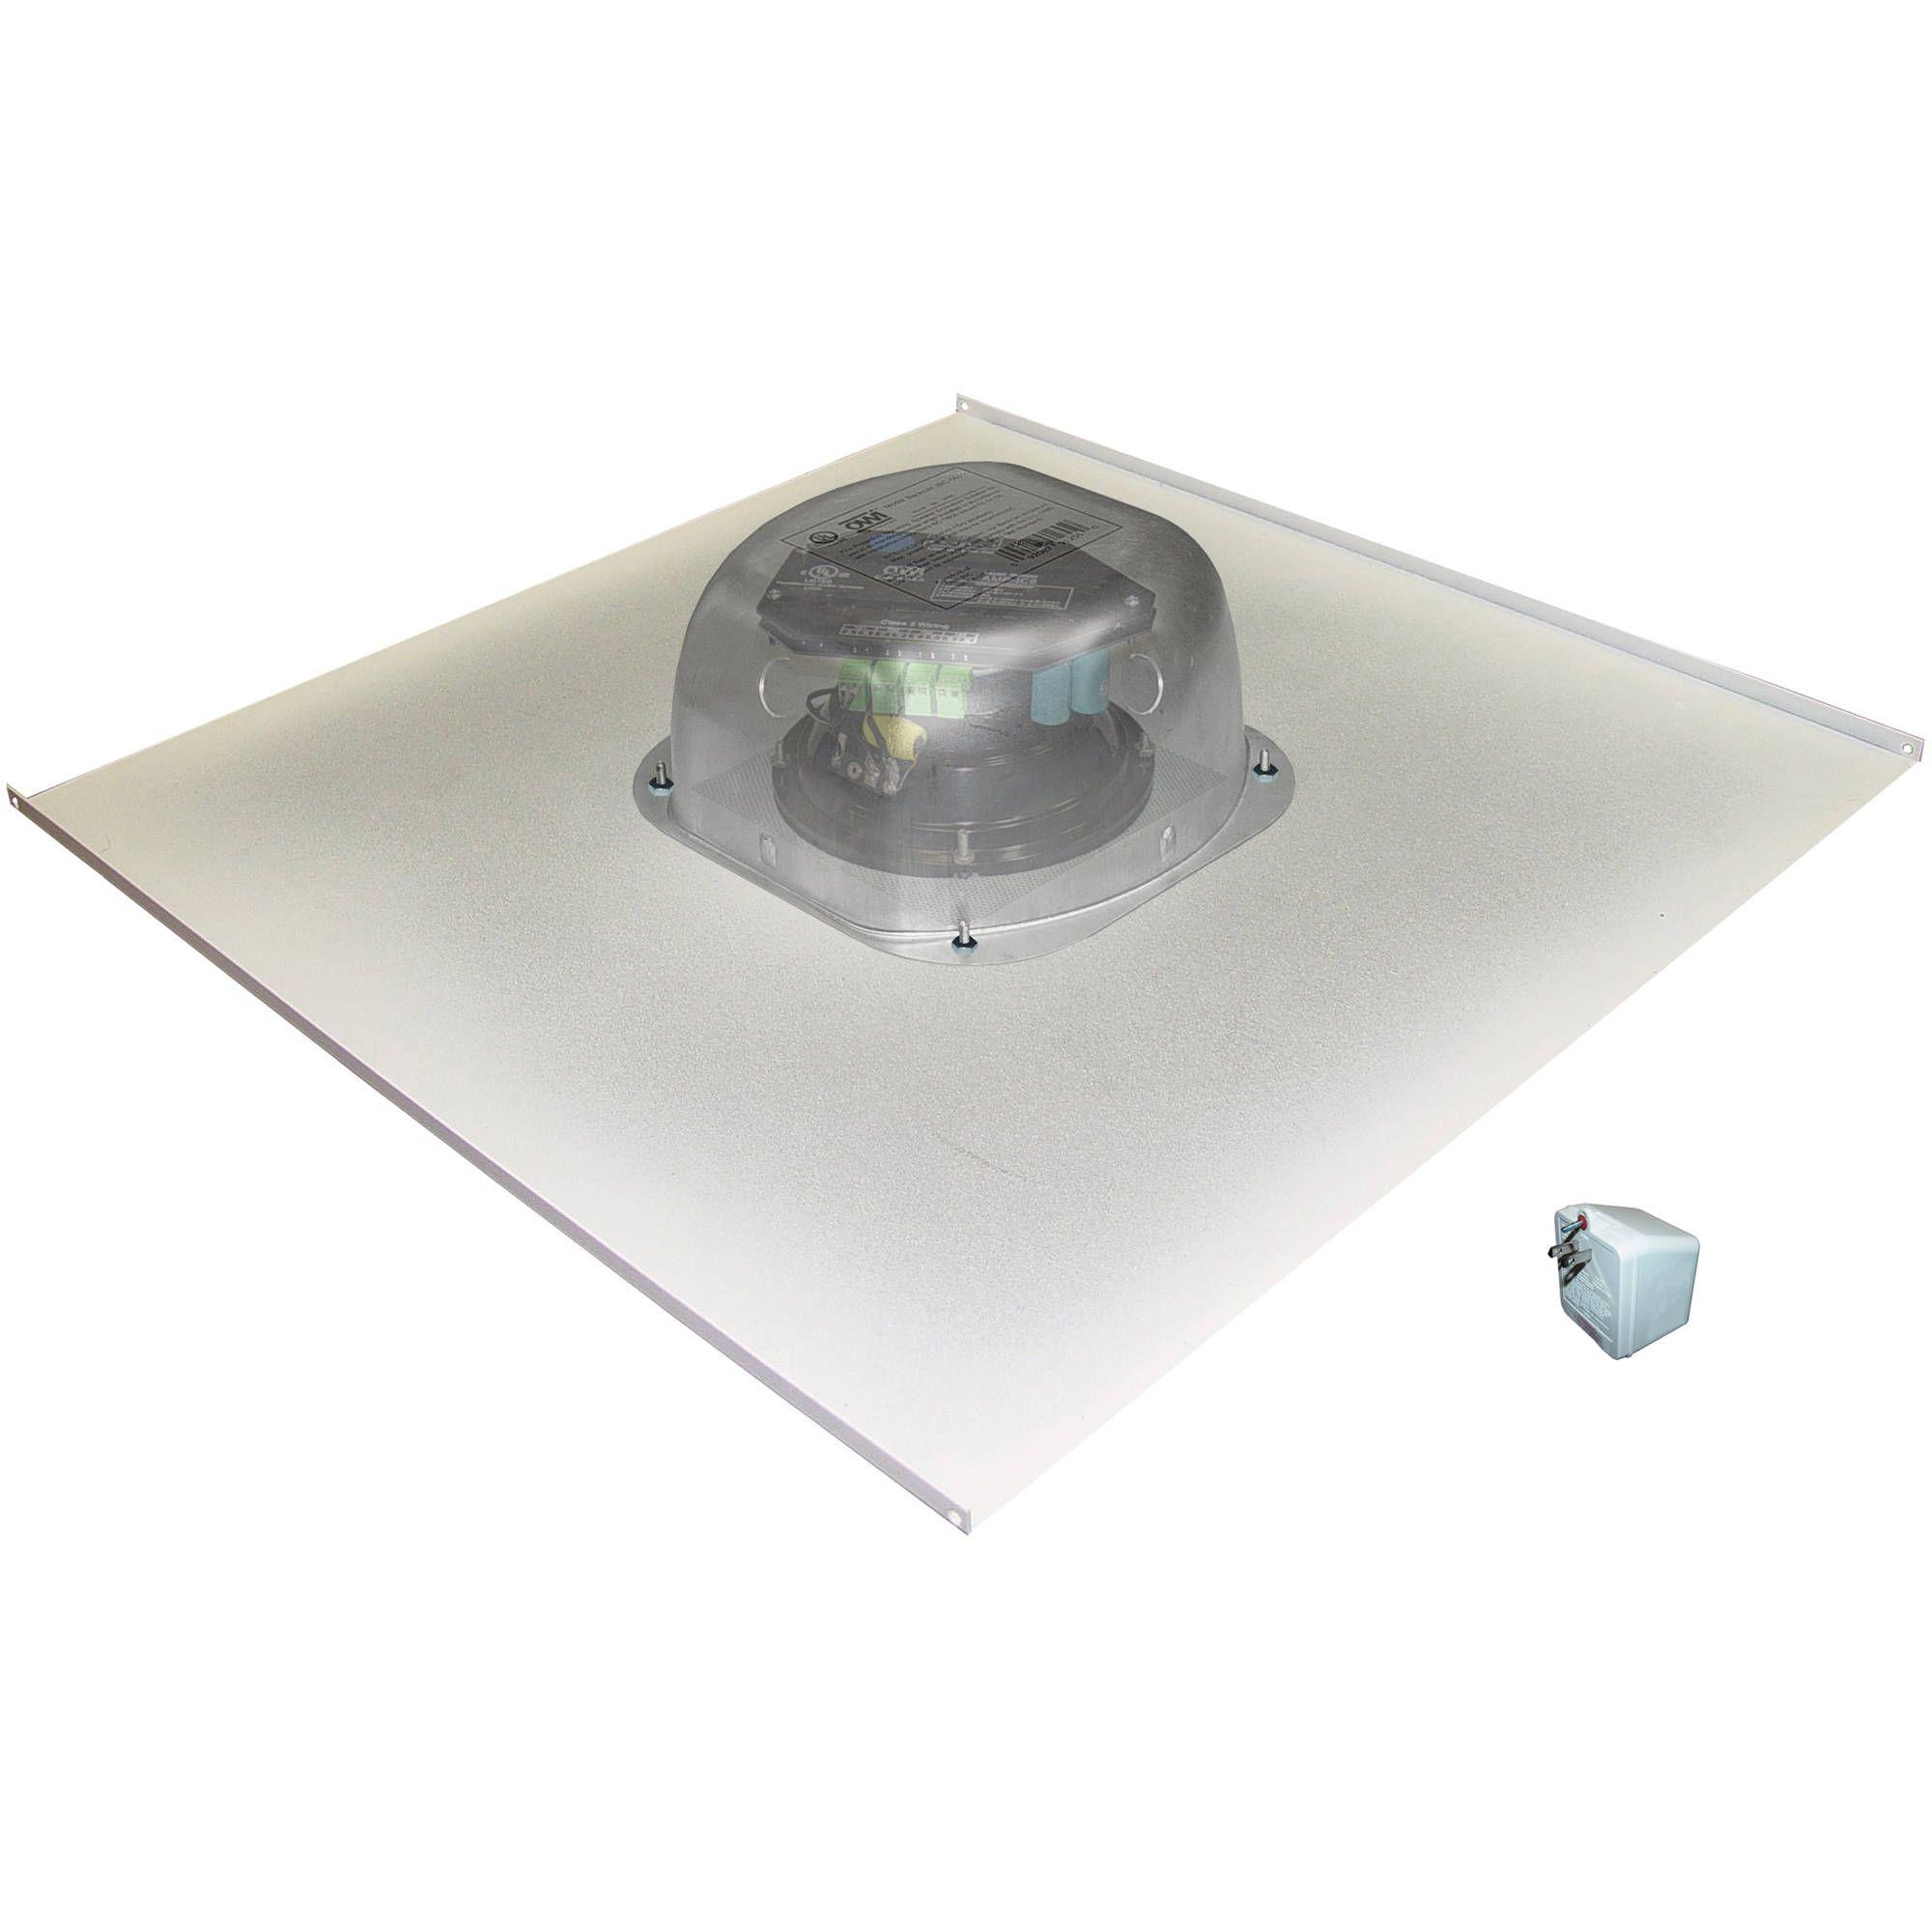 Drop tile ceiling speakers httpcreativechairsandtables drop tile ceiling speakers dailygadgetfo Images